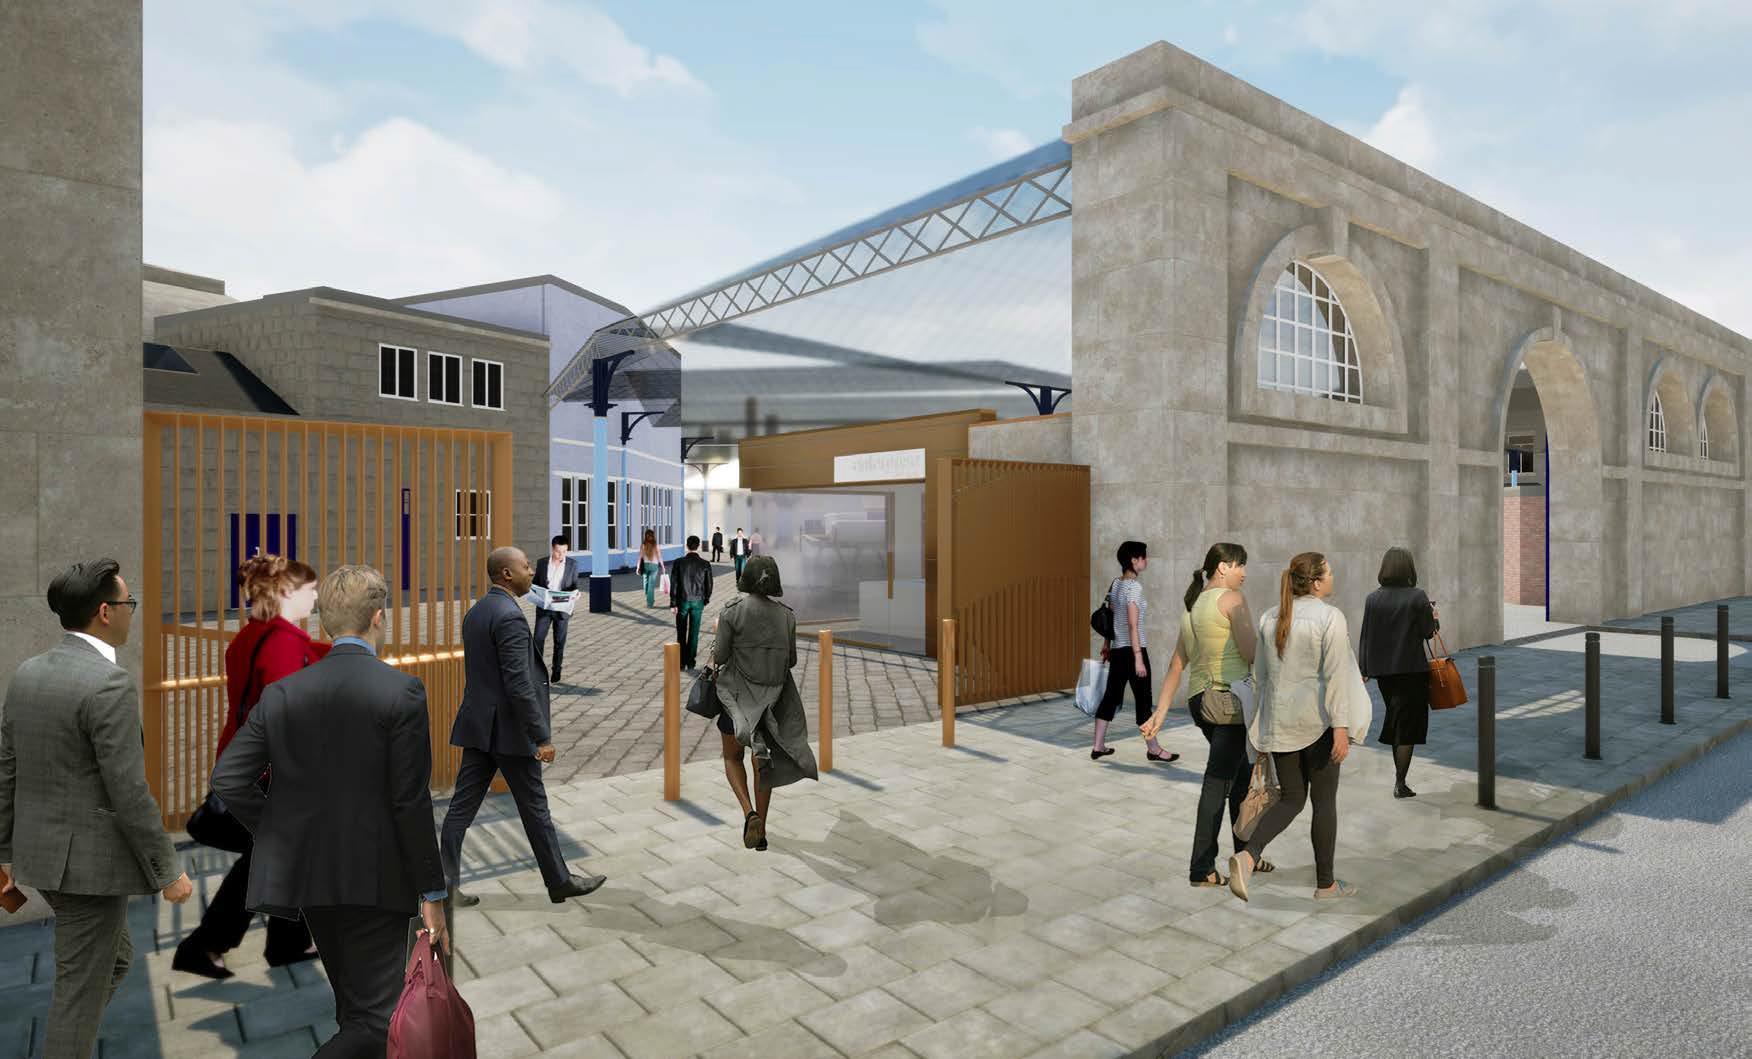 Newcastle Central Station Neville Street entrance